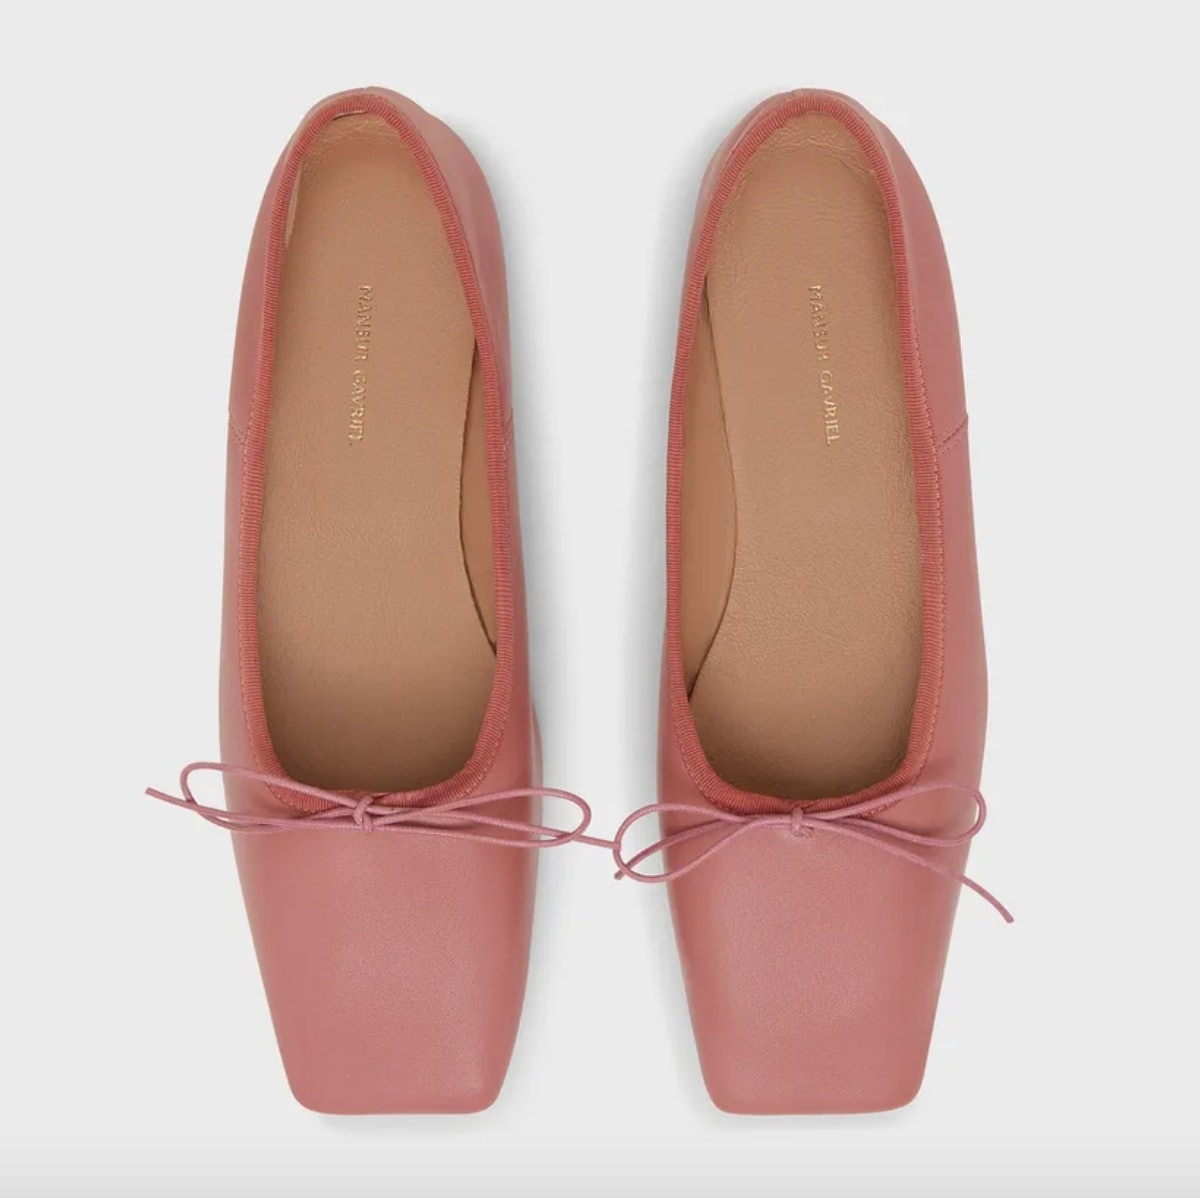 mansur gavriel pink ballet flats